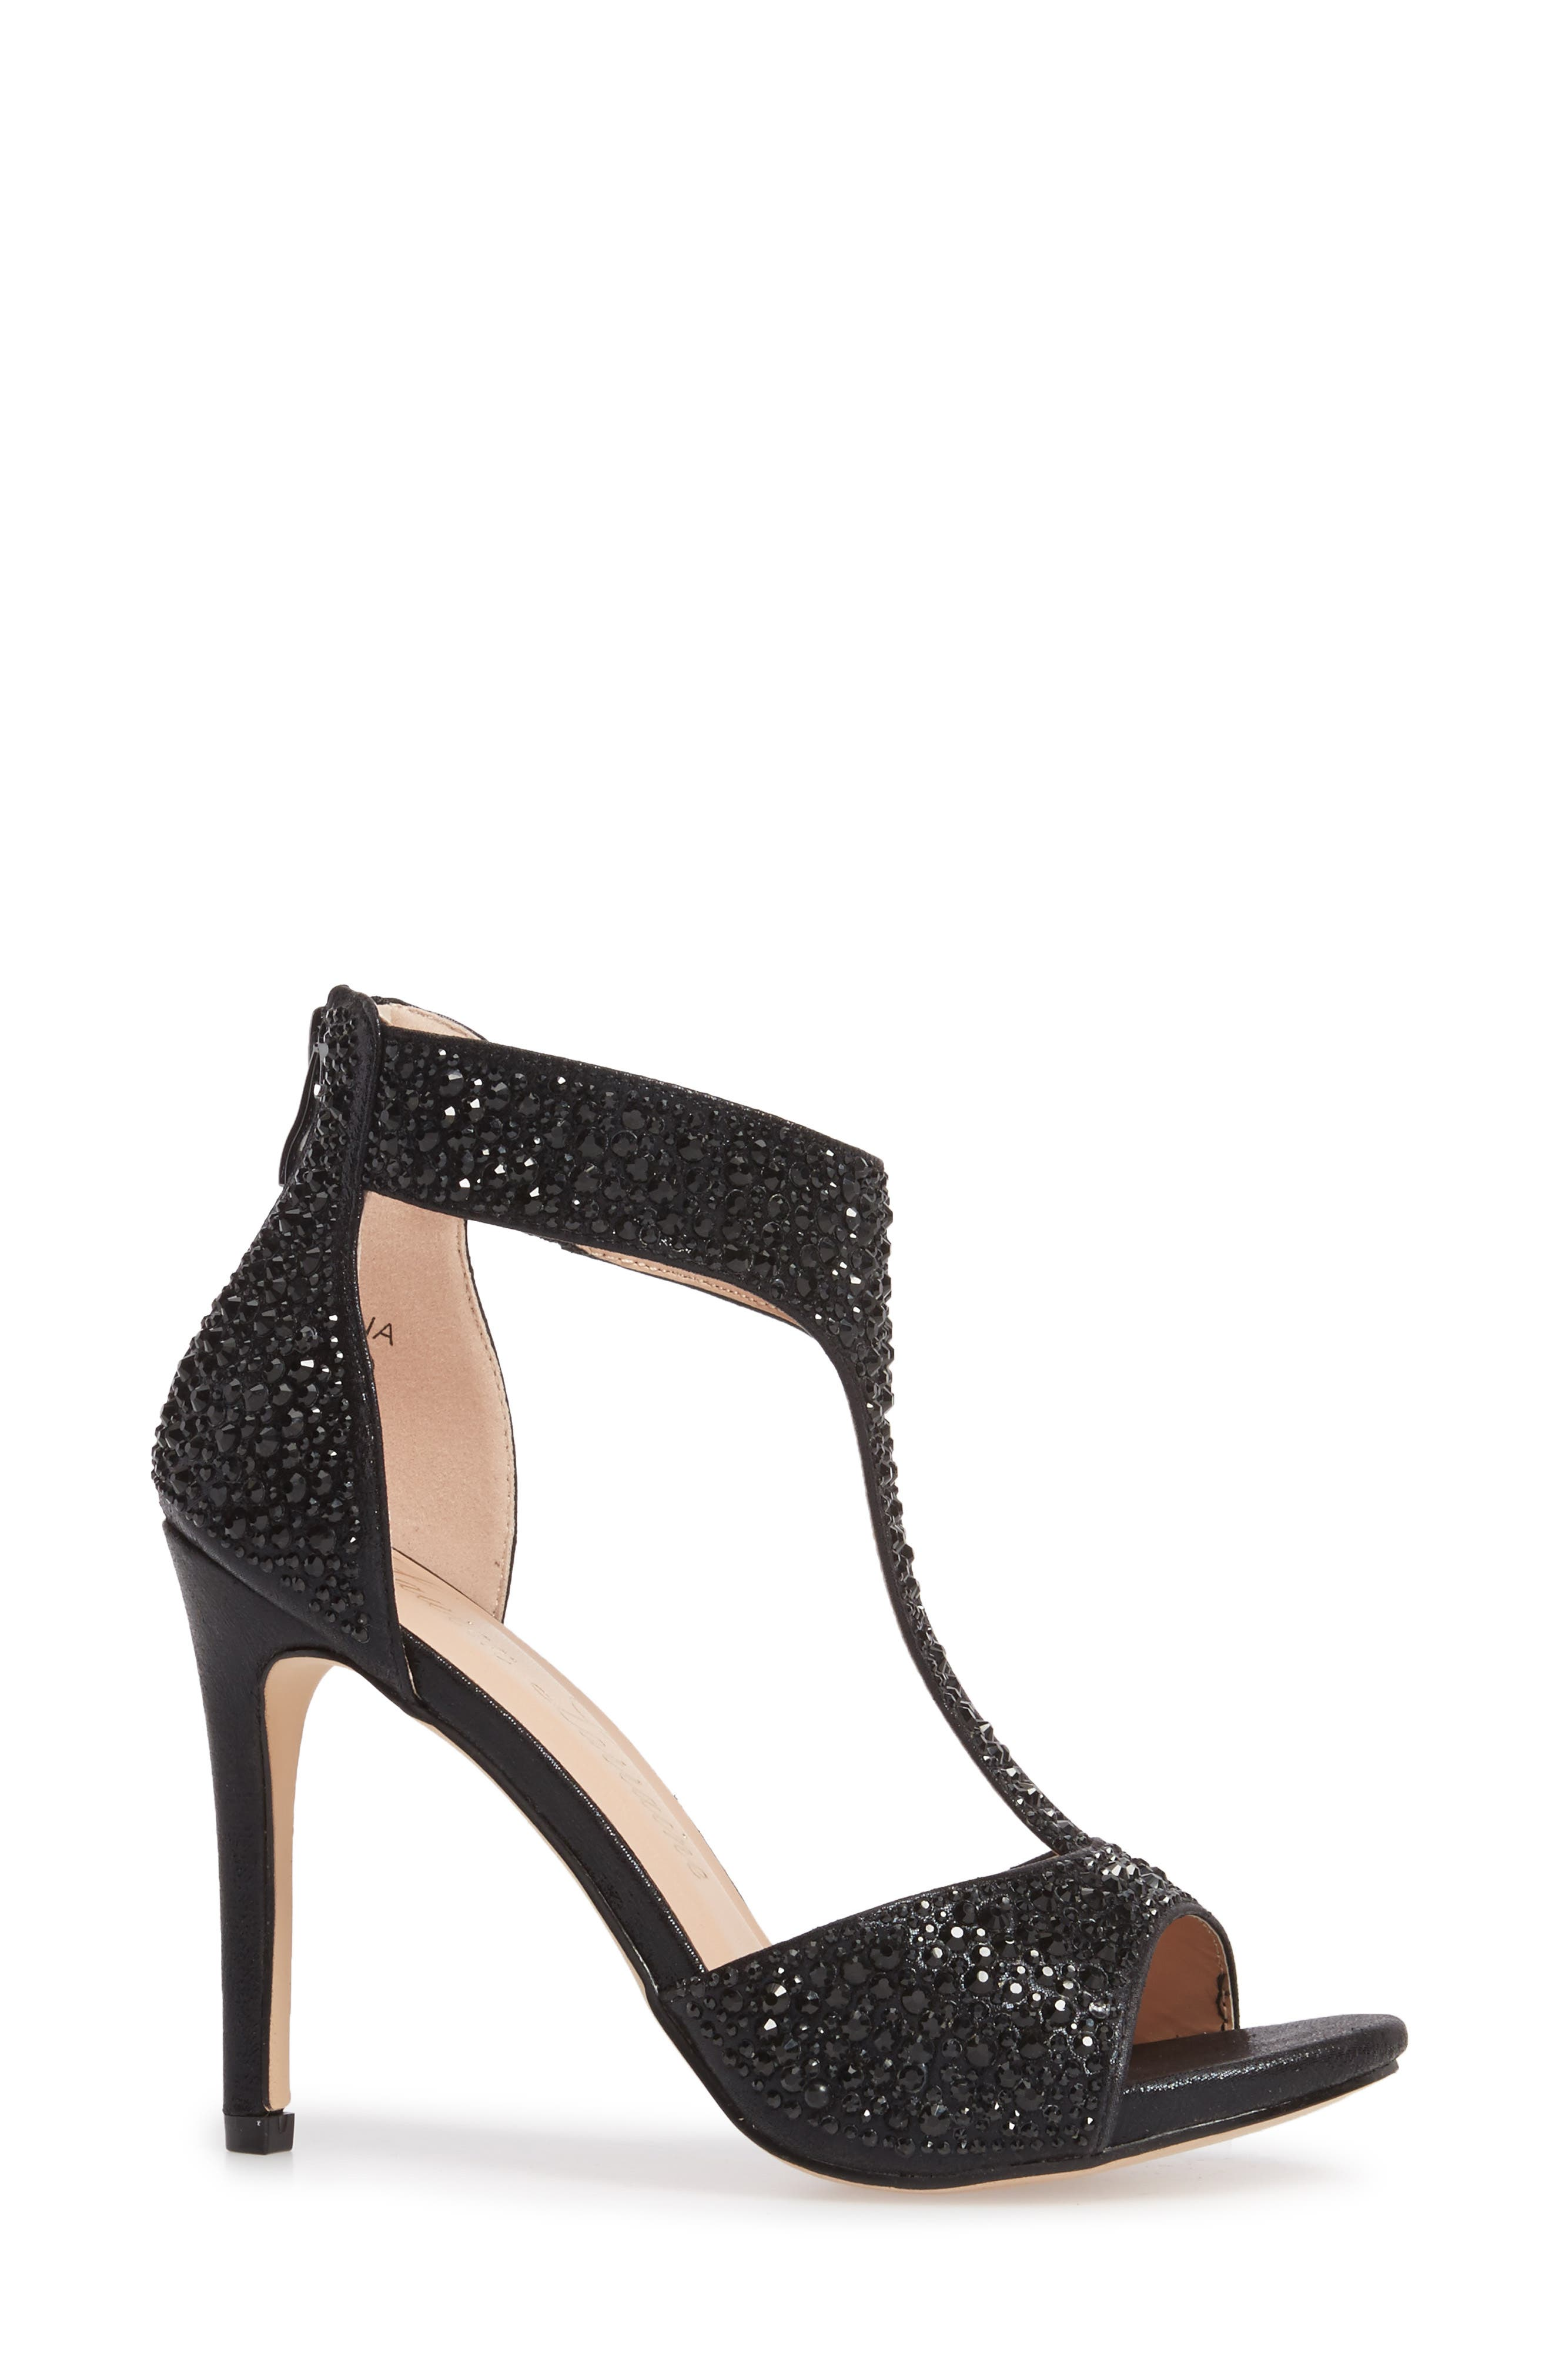 LAUREN LORRAINE, Ina Crystal Embellished Sandal, Alternate thumbnail 3, color, 001